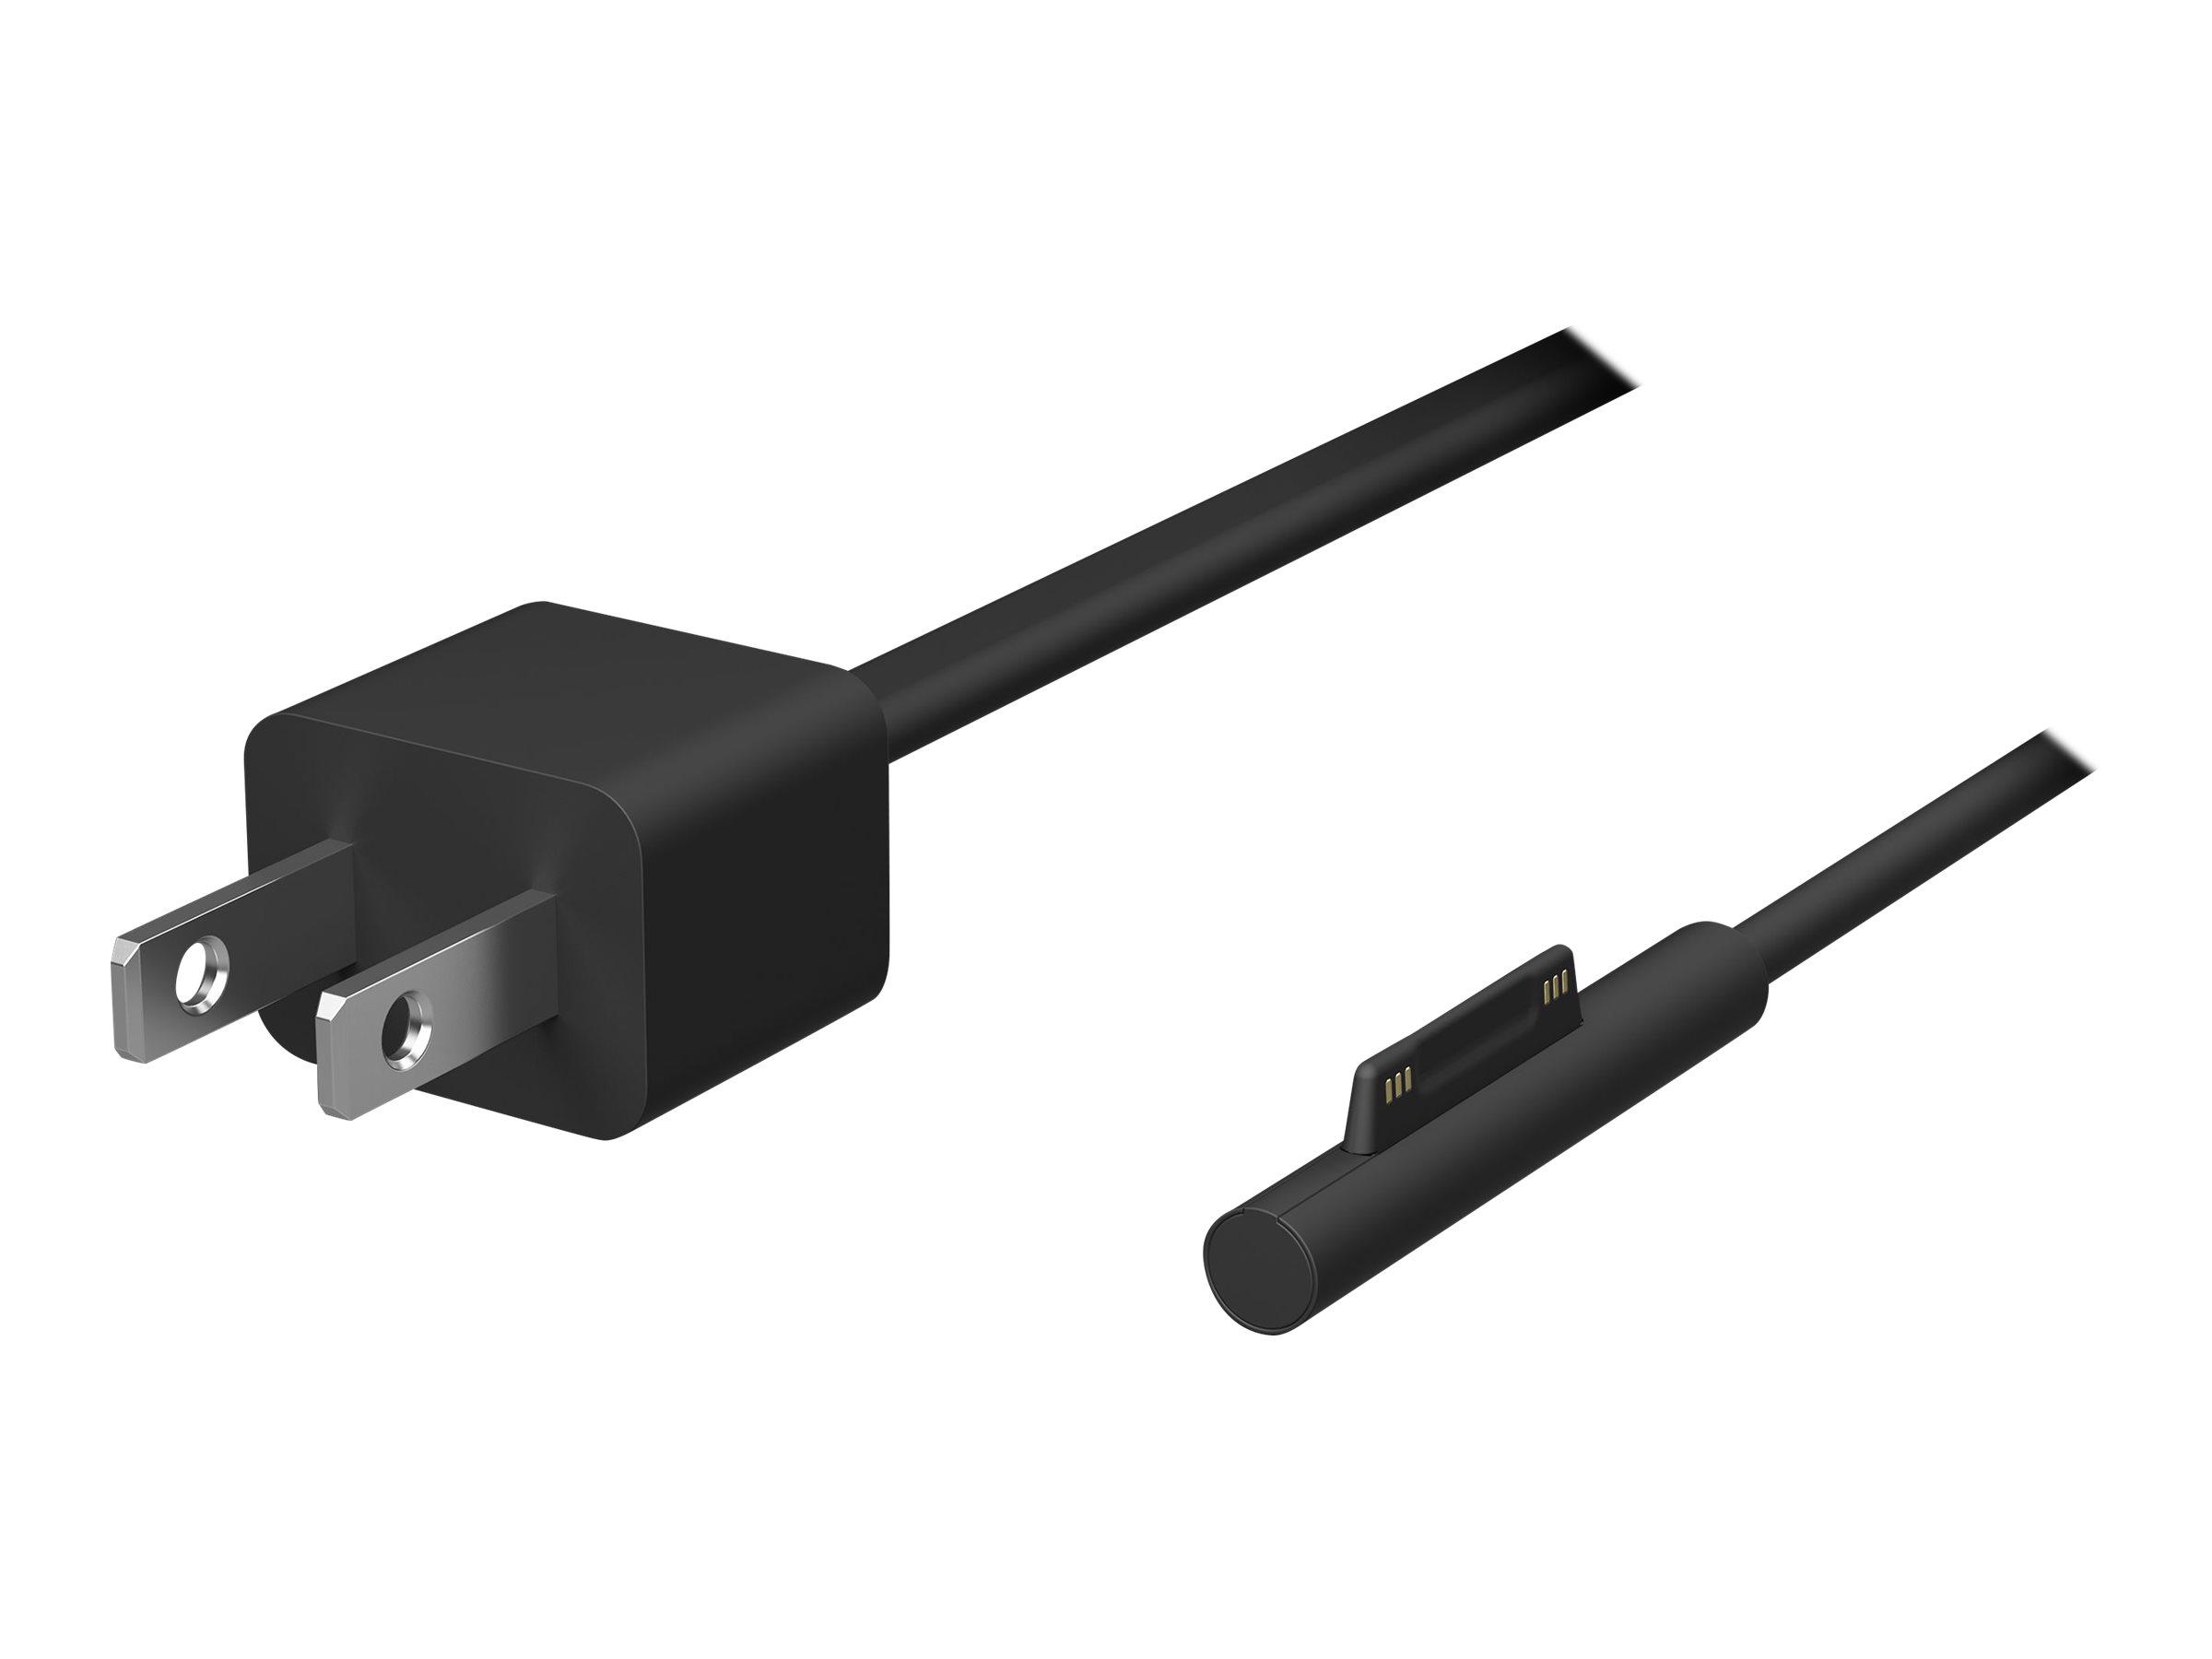 Microsoft Surface 65W Power Supply - power adapter - 65 Watt